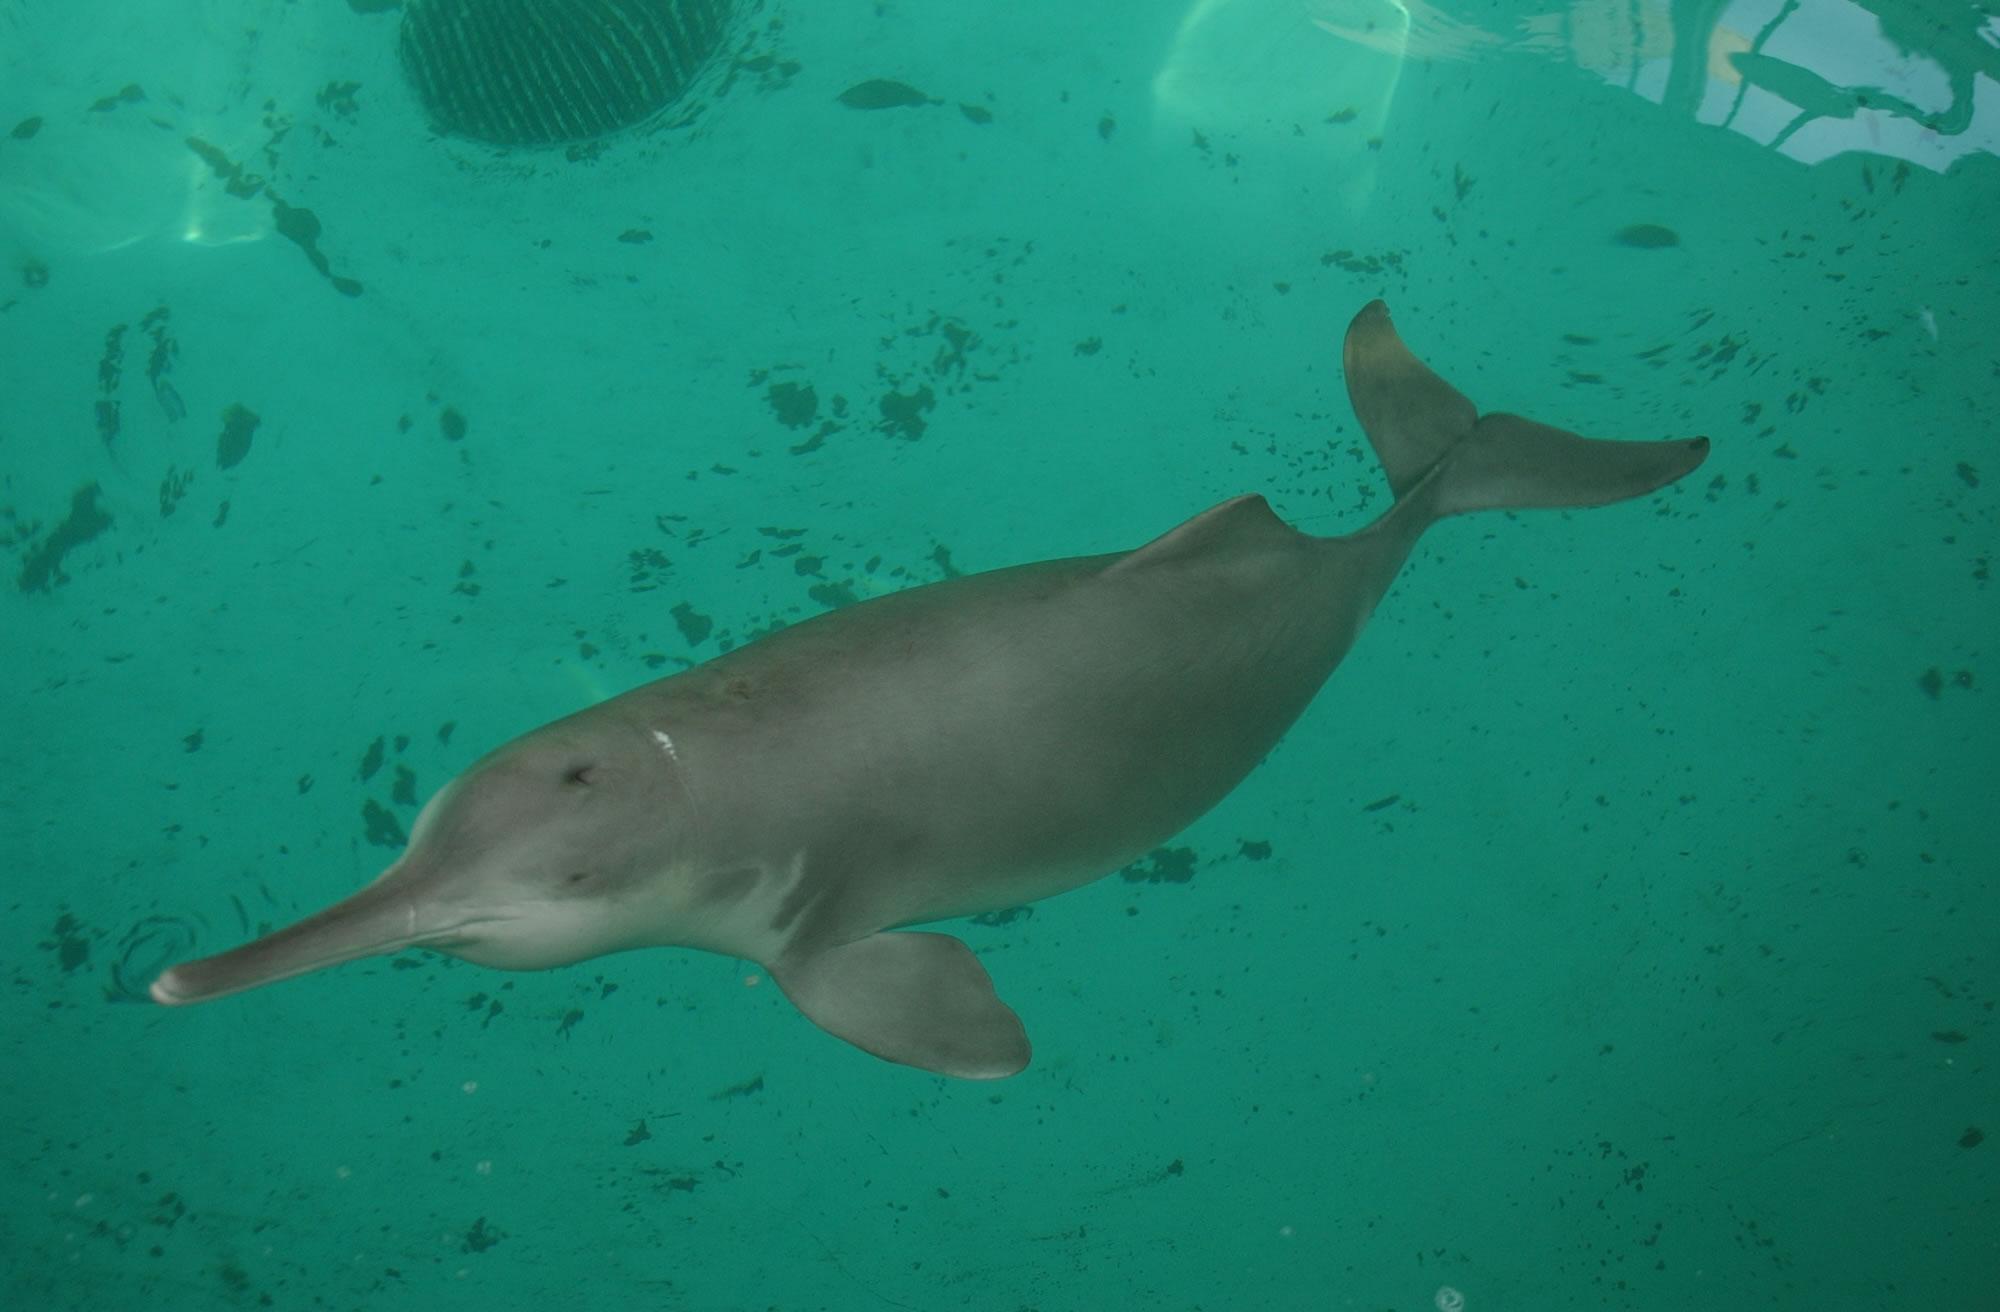 espèces-animaux-disparus-dauphin-chine